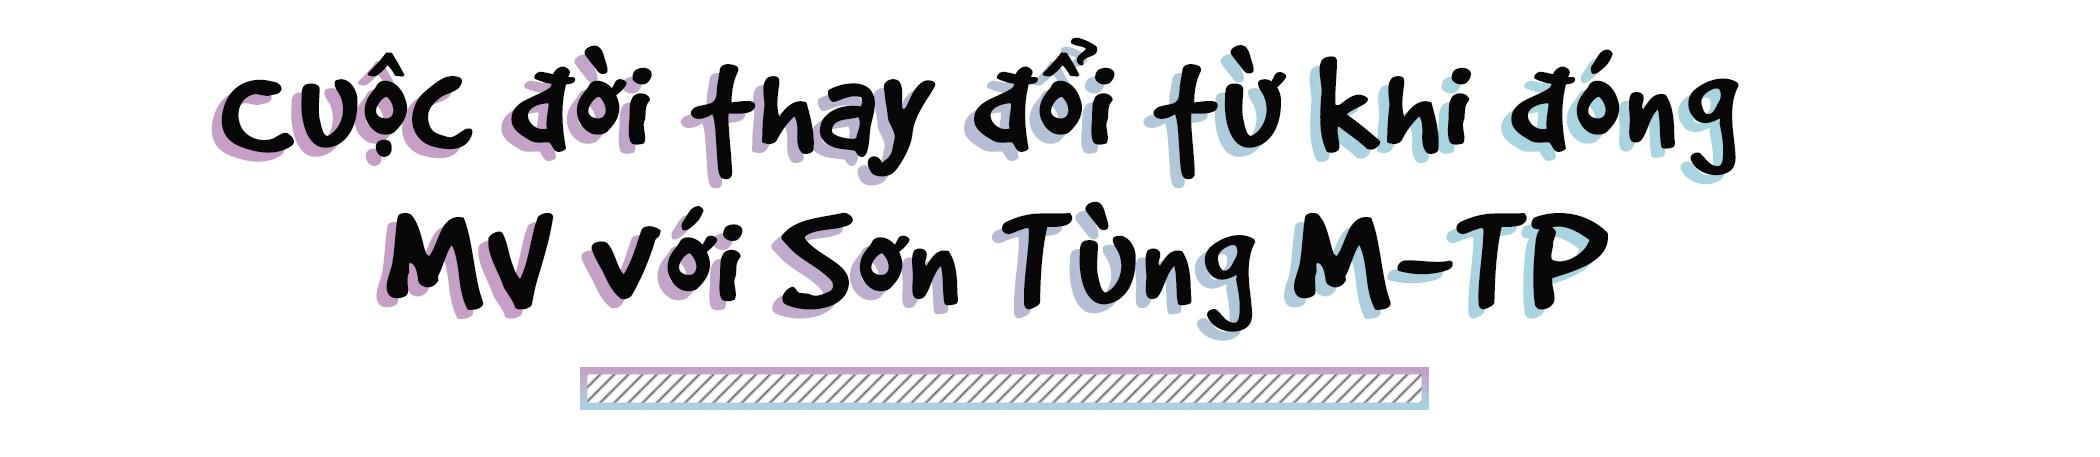 Cara: Minh se vuot qua cai bong 'ban gai Son Tung M-TP' hinh anh 5